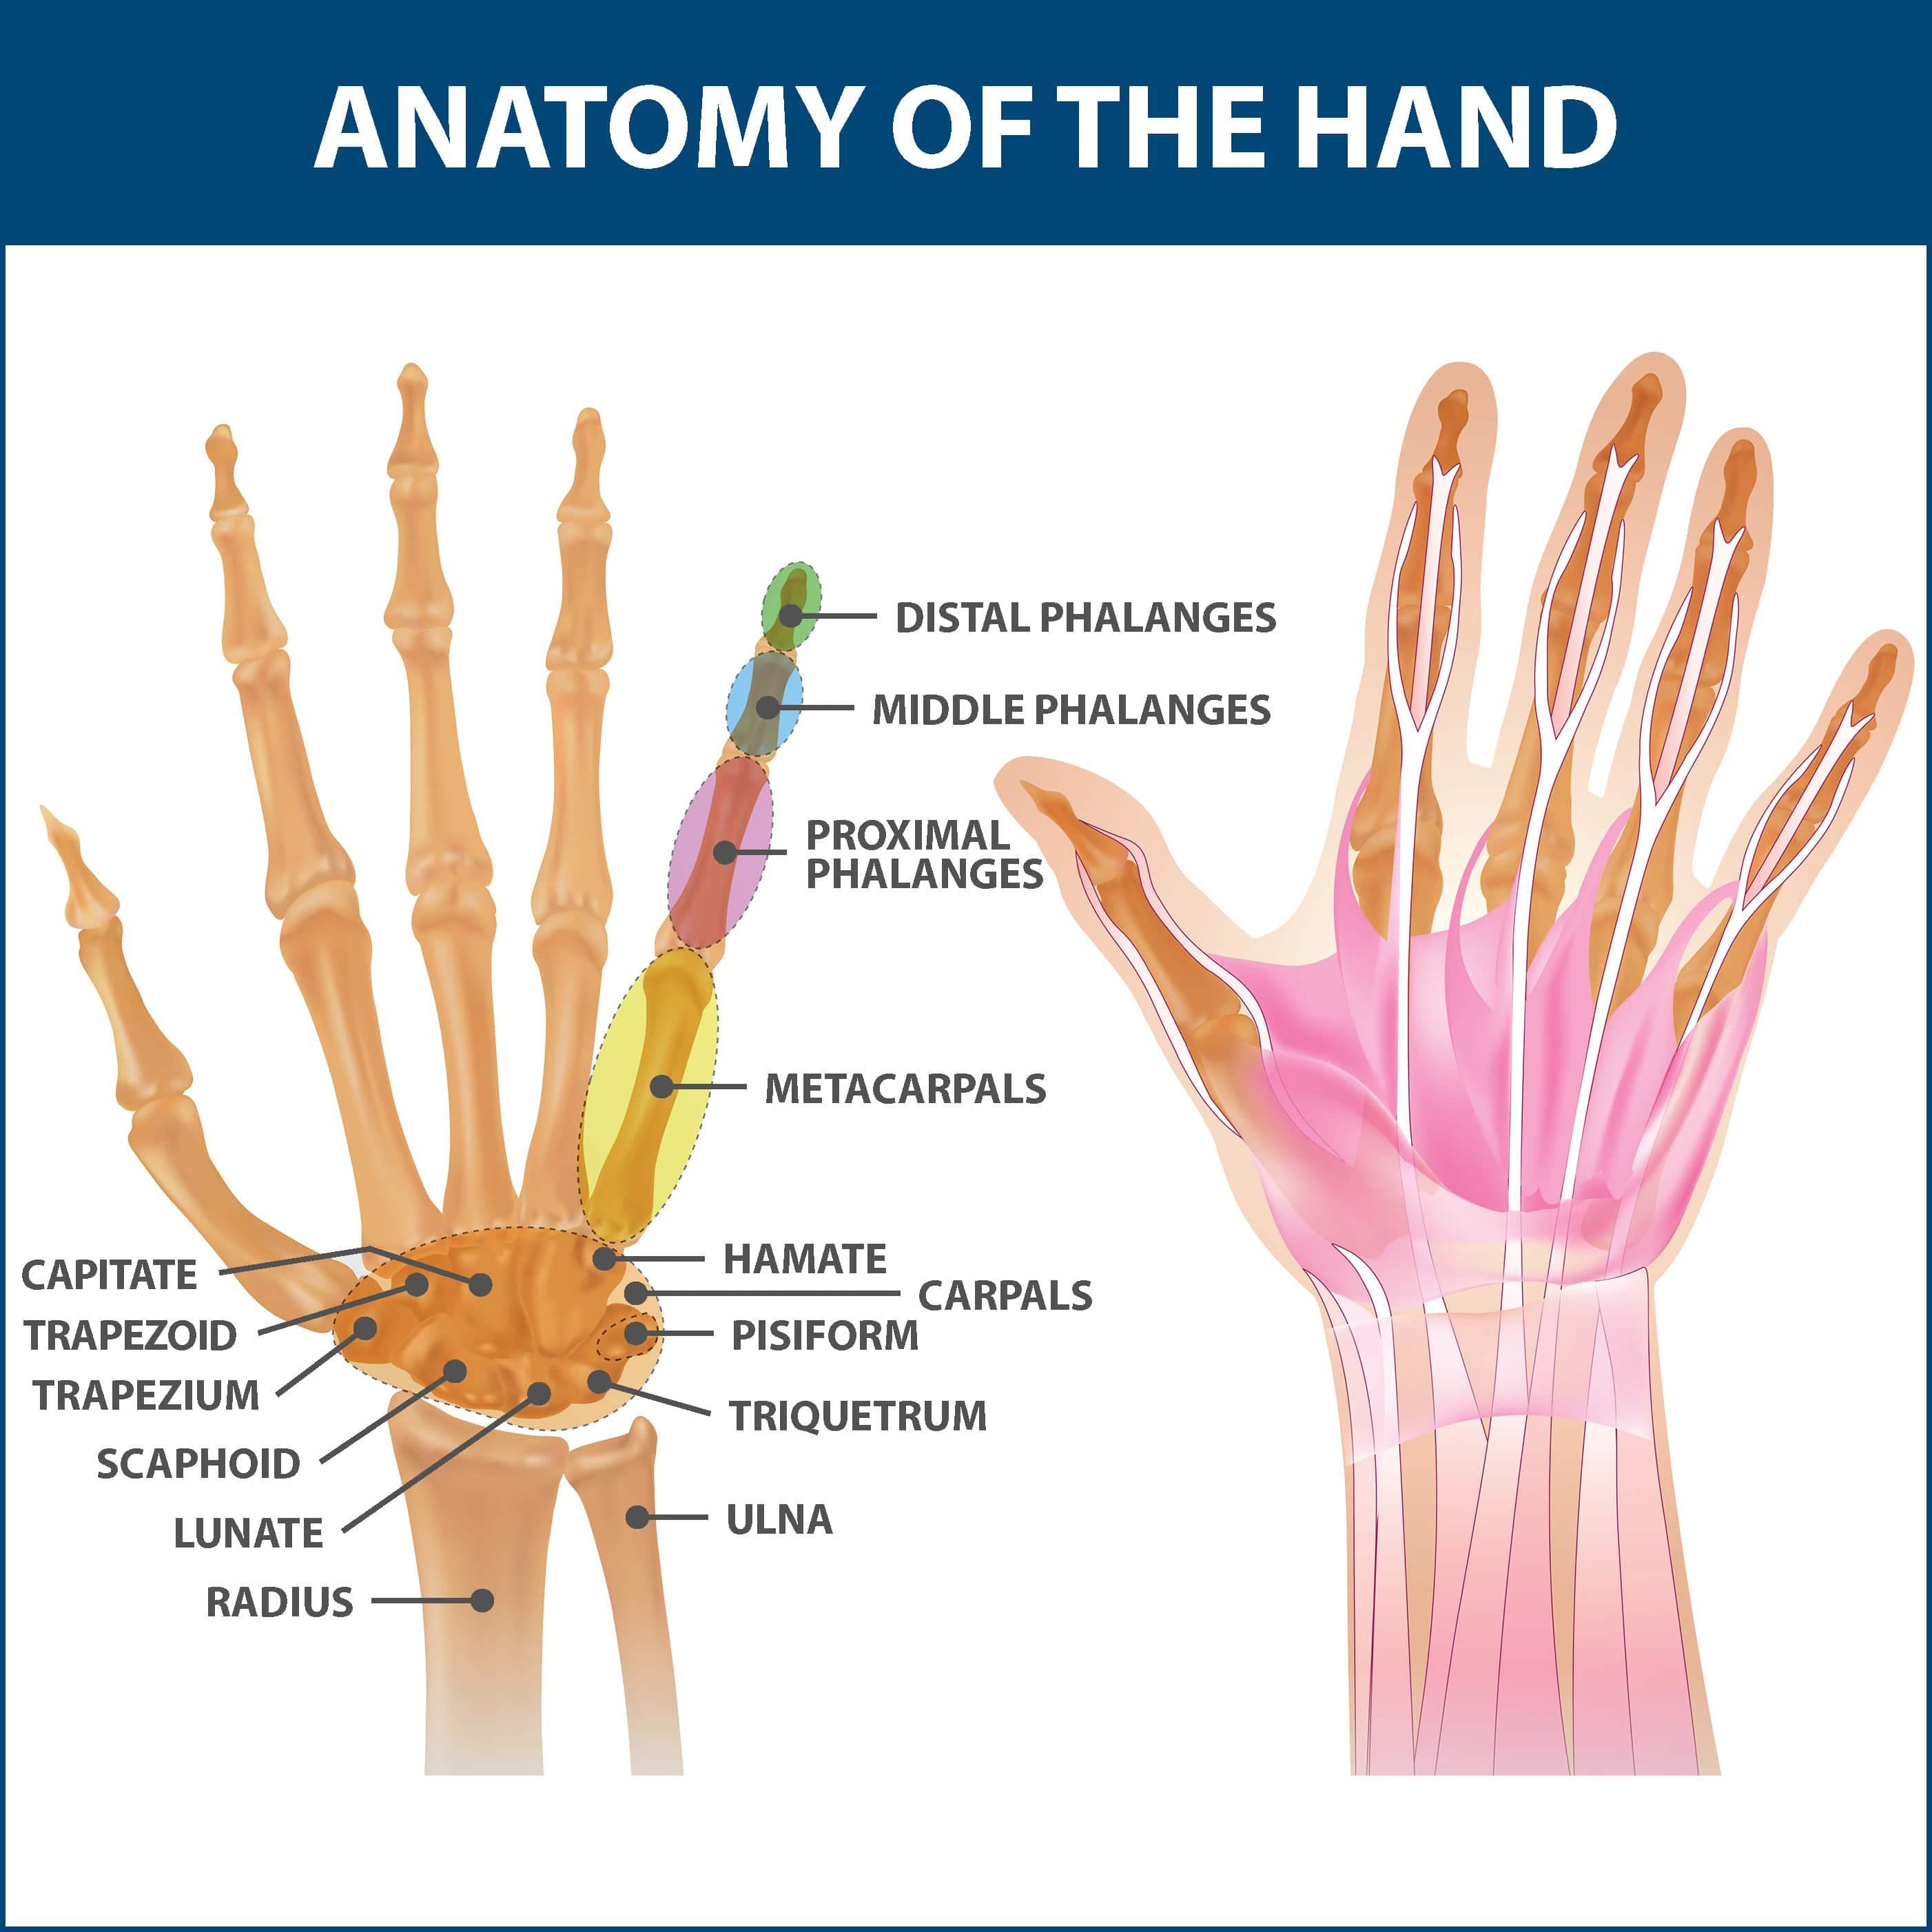 Rheumatoid Arthritis Anatomy of the Hand